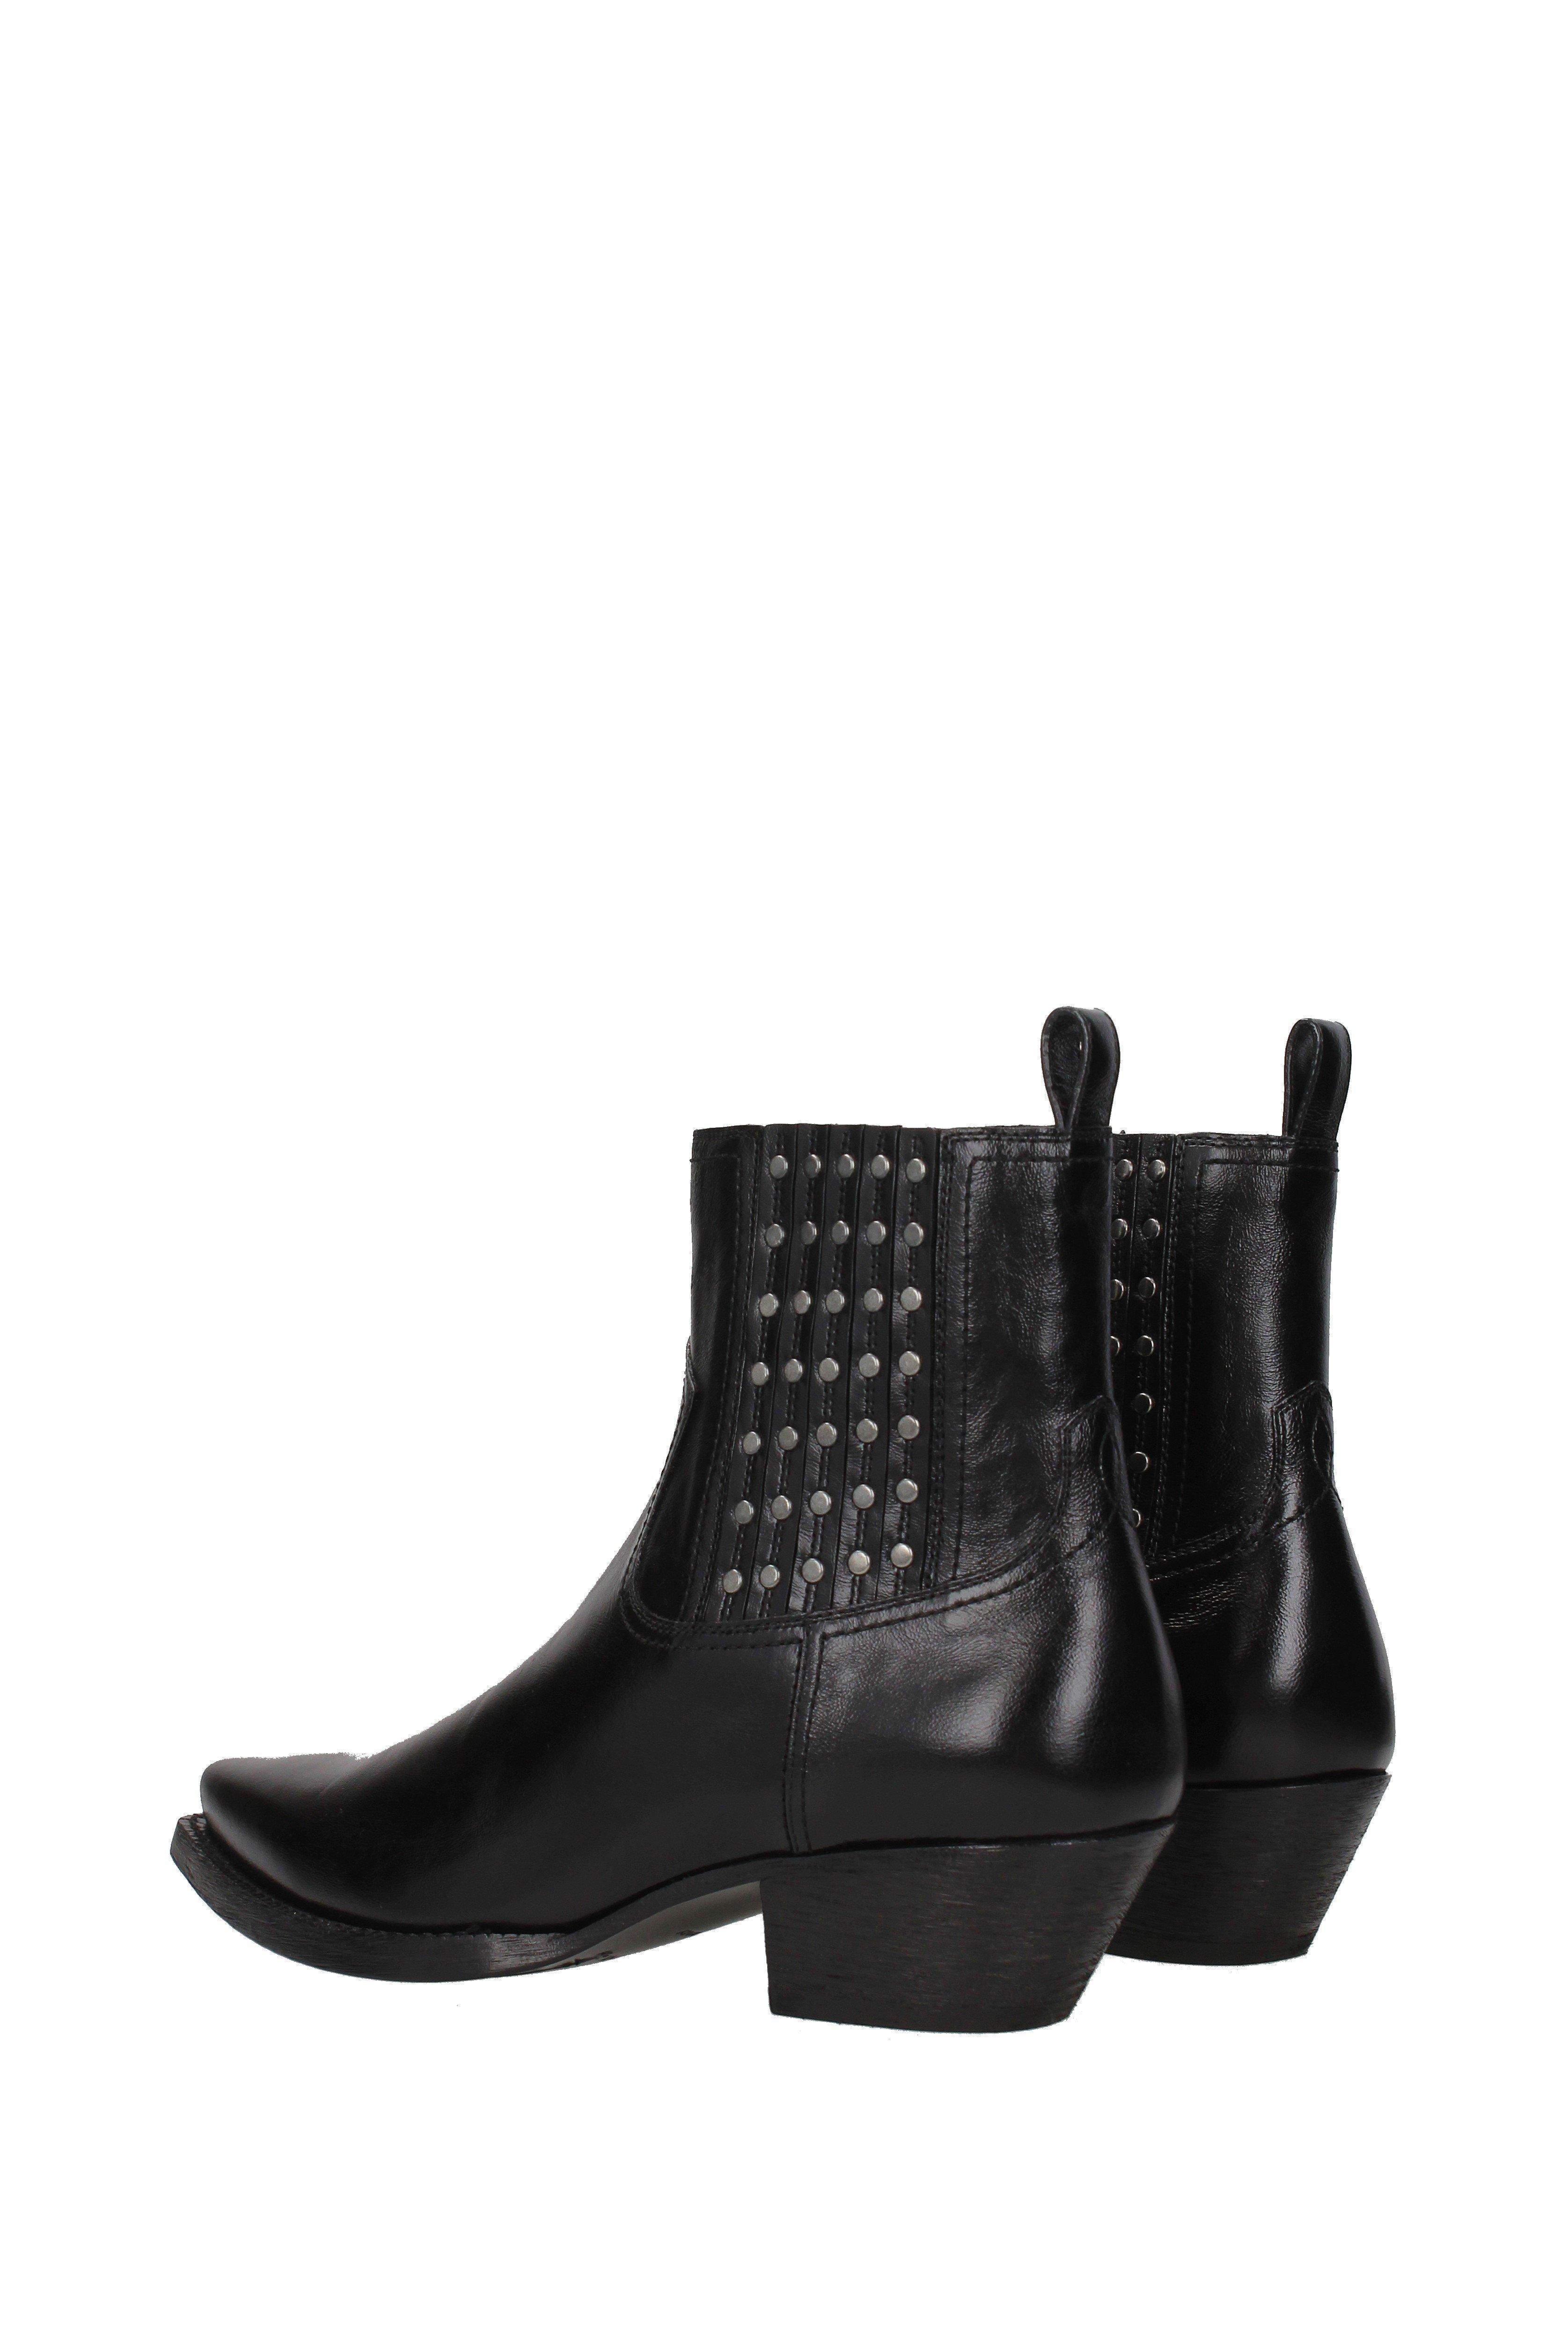 c94c3824807 Saint Laurent - Ankle Boots Houston Men Black for Men - Lyst. View  fullscreen